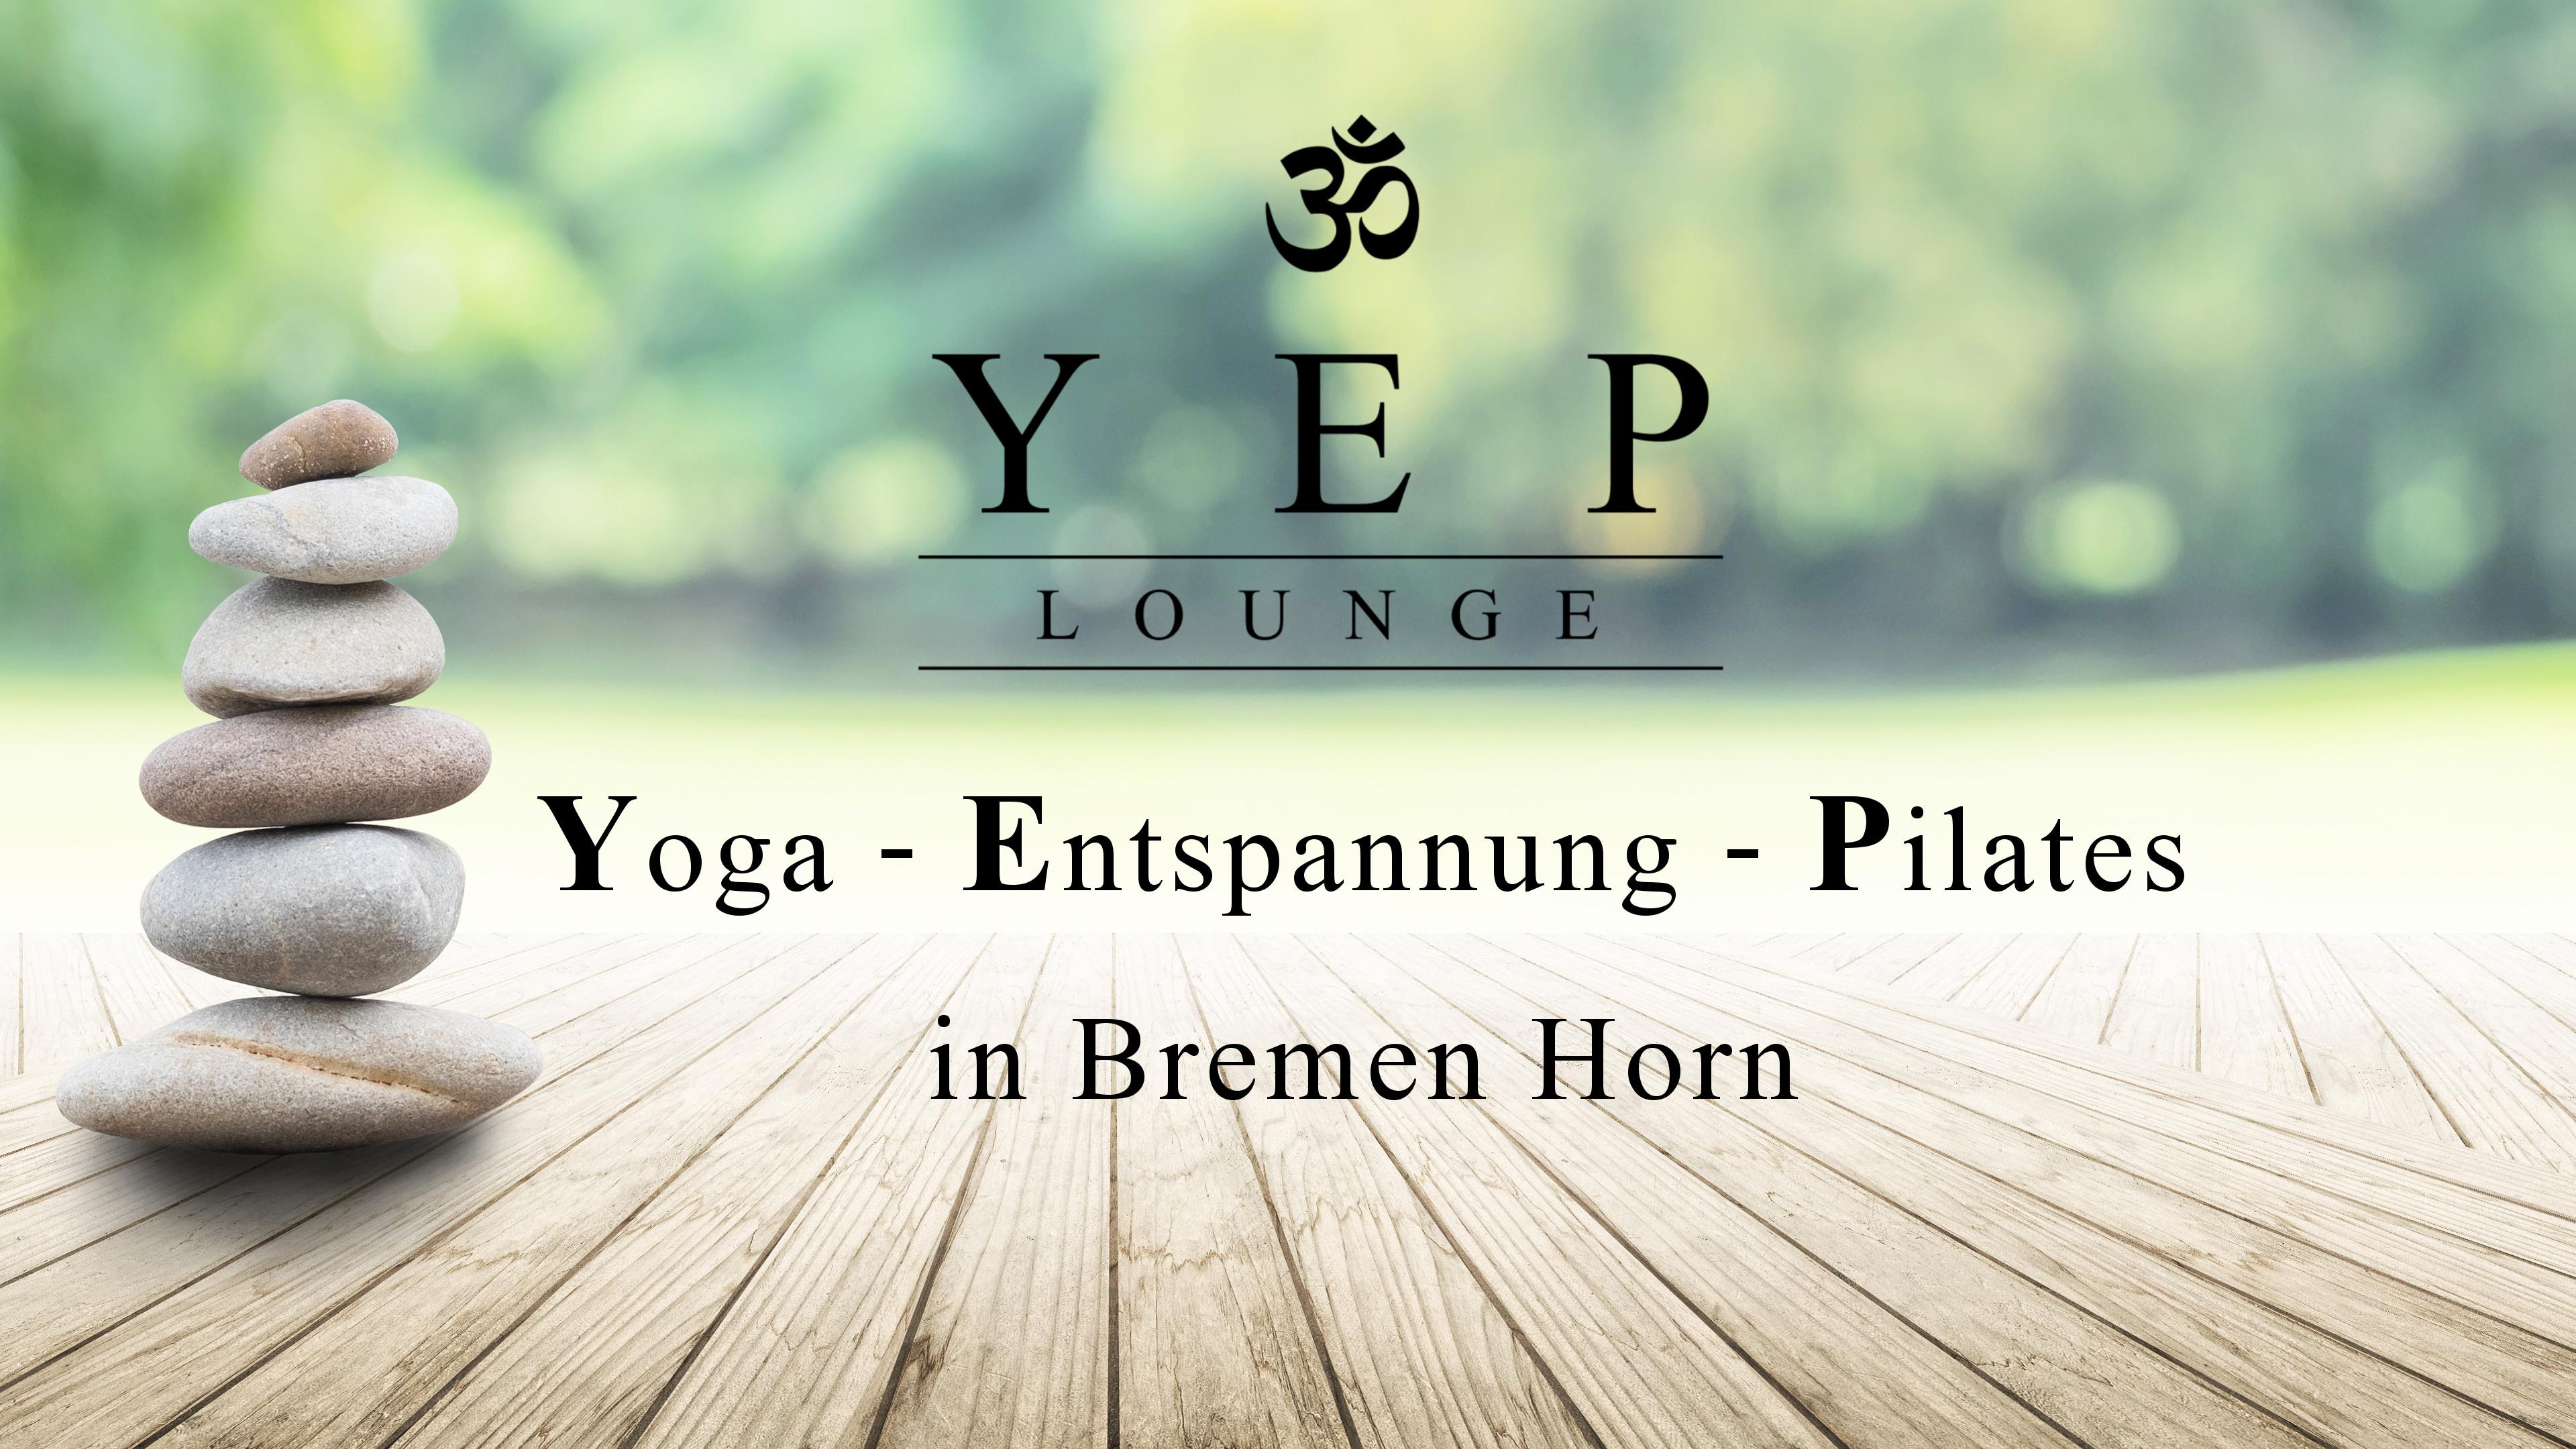 Personal Yoga in Bremen - Yogatherapie mit Yulia Eberle in der YEP Lounge